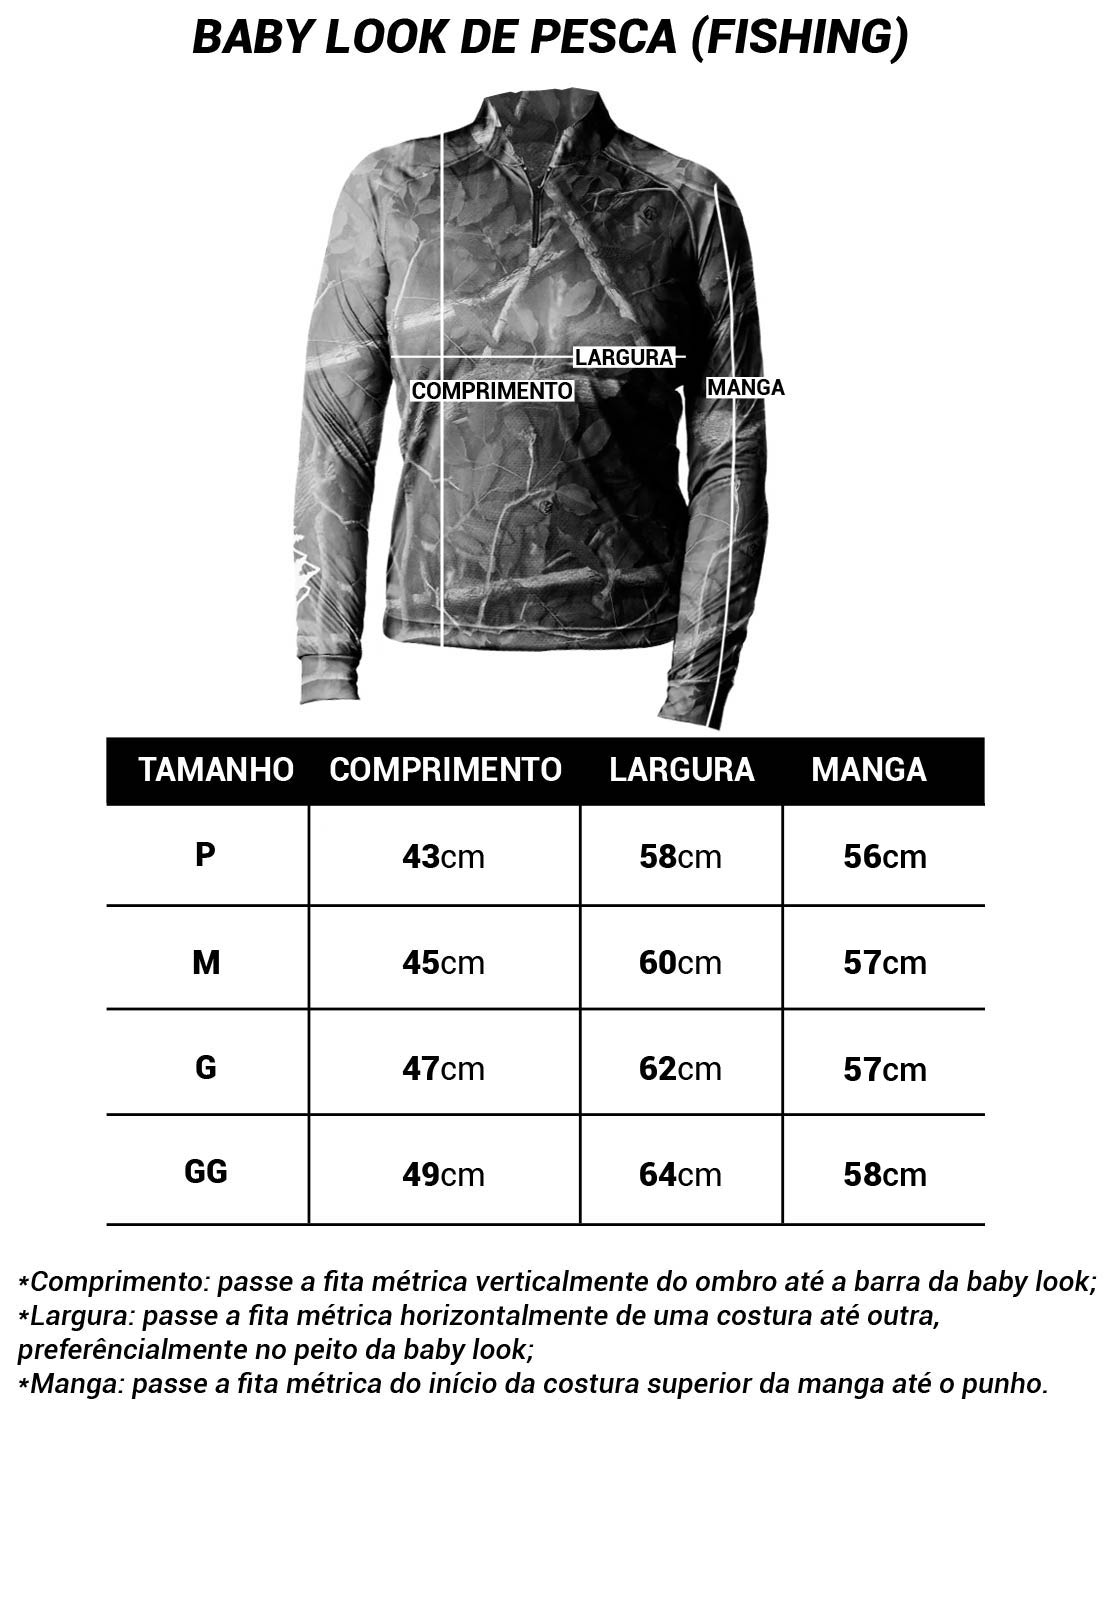 CAMISA DE PESCA FISH CAMUFLADA PRO 25 FEMININA + BANDANA GRÁTIS  - REAL HUNTER OUTDOORS